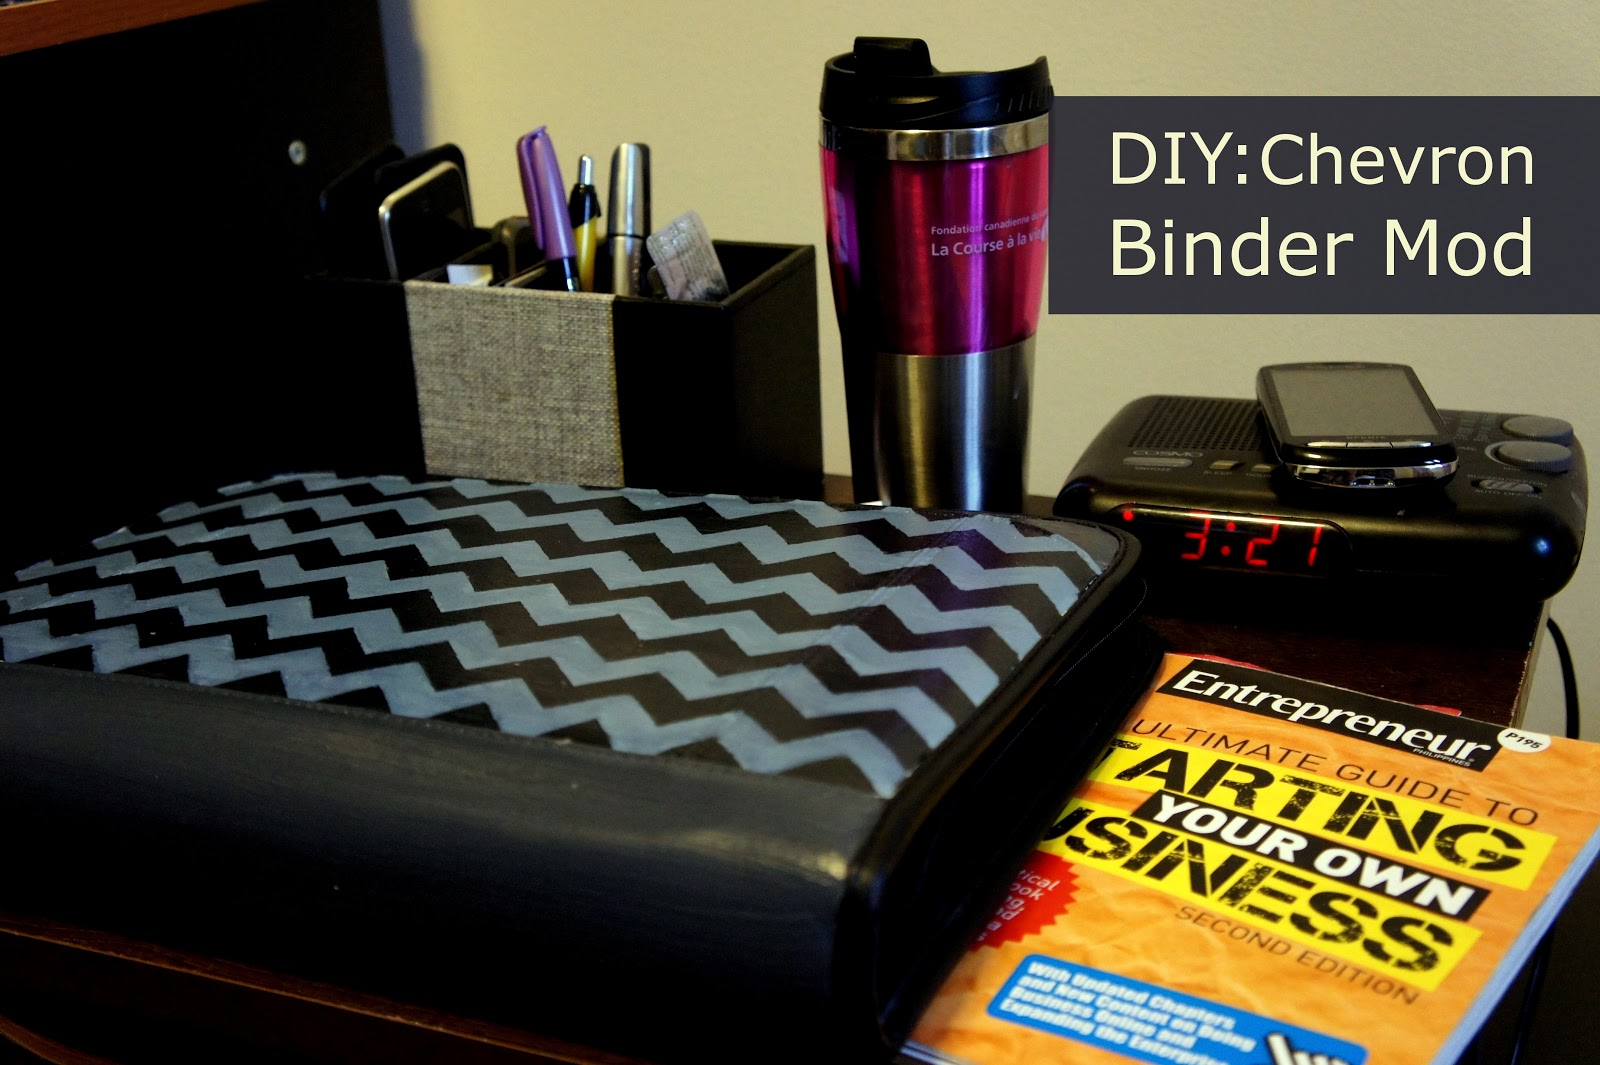 DIY: Chevron Binder